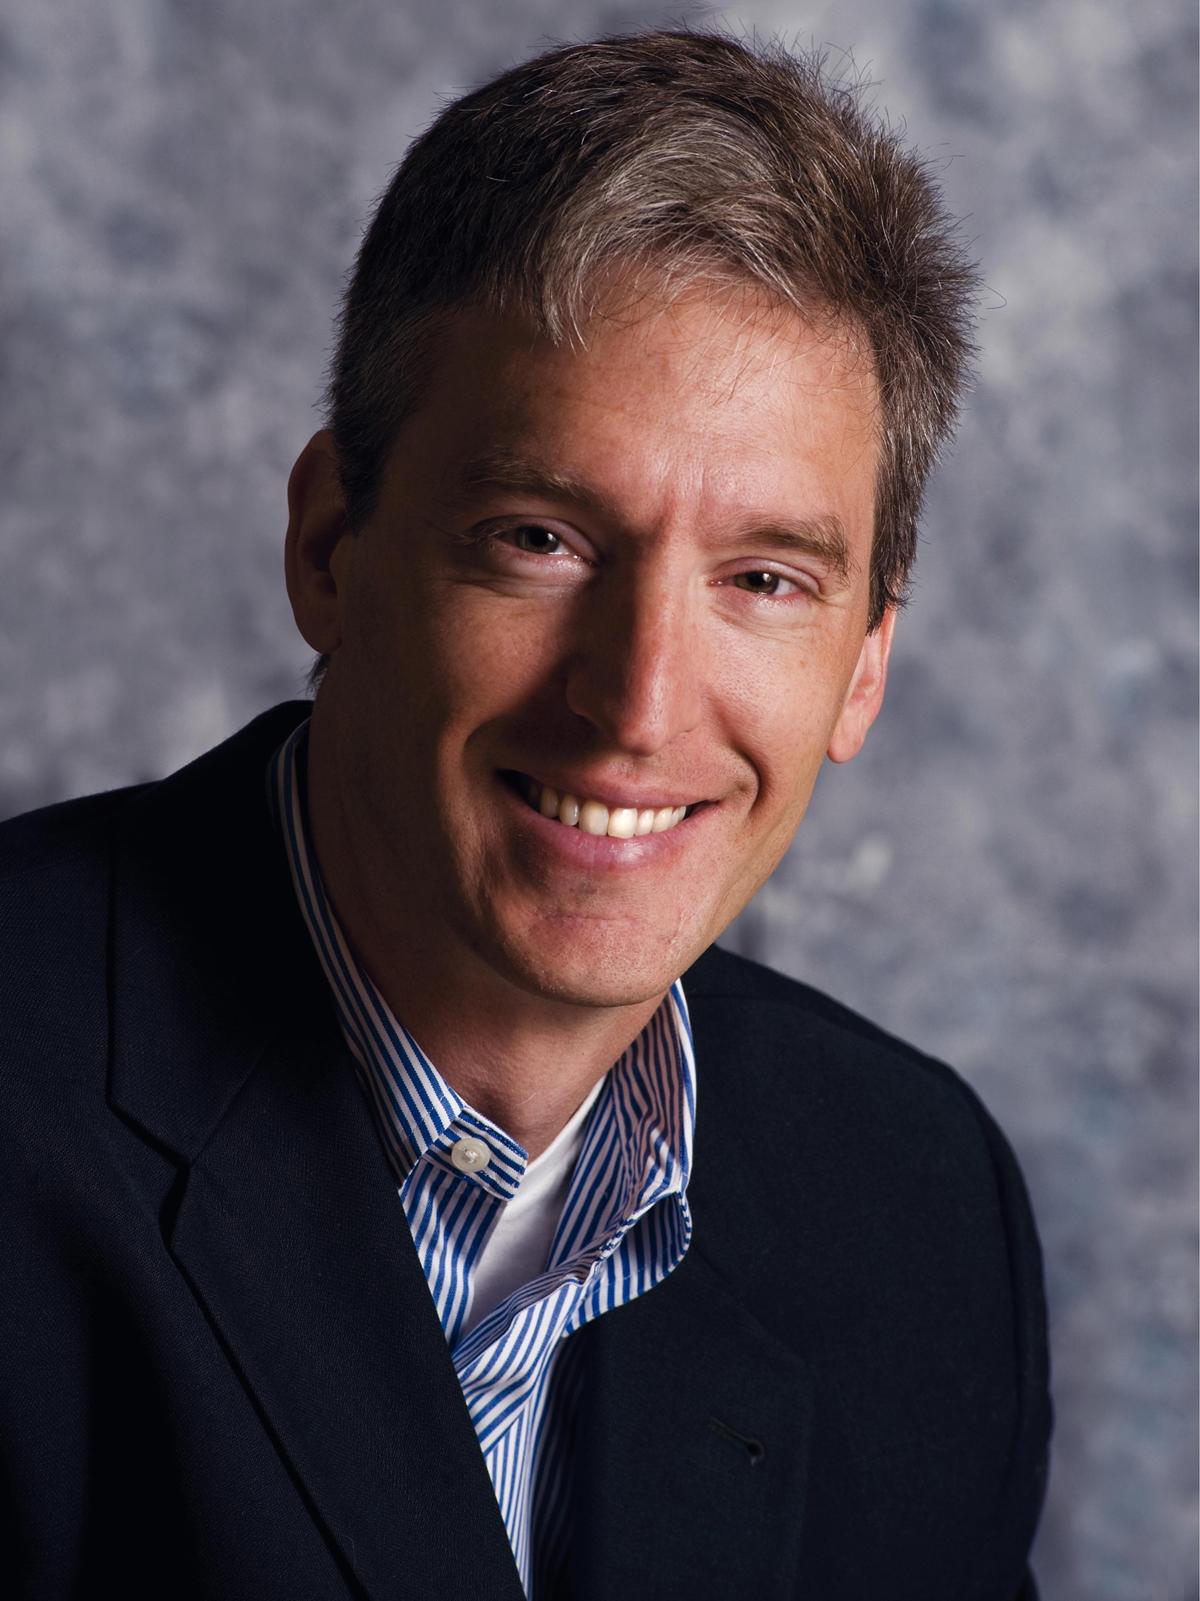 Steven D. Levitt